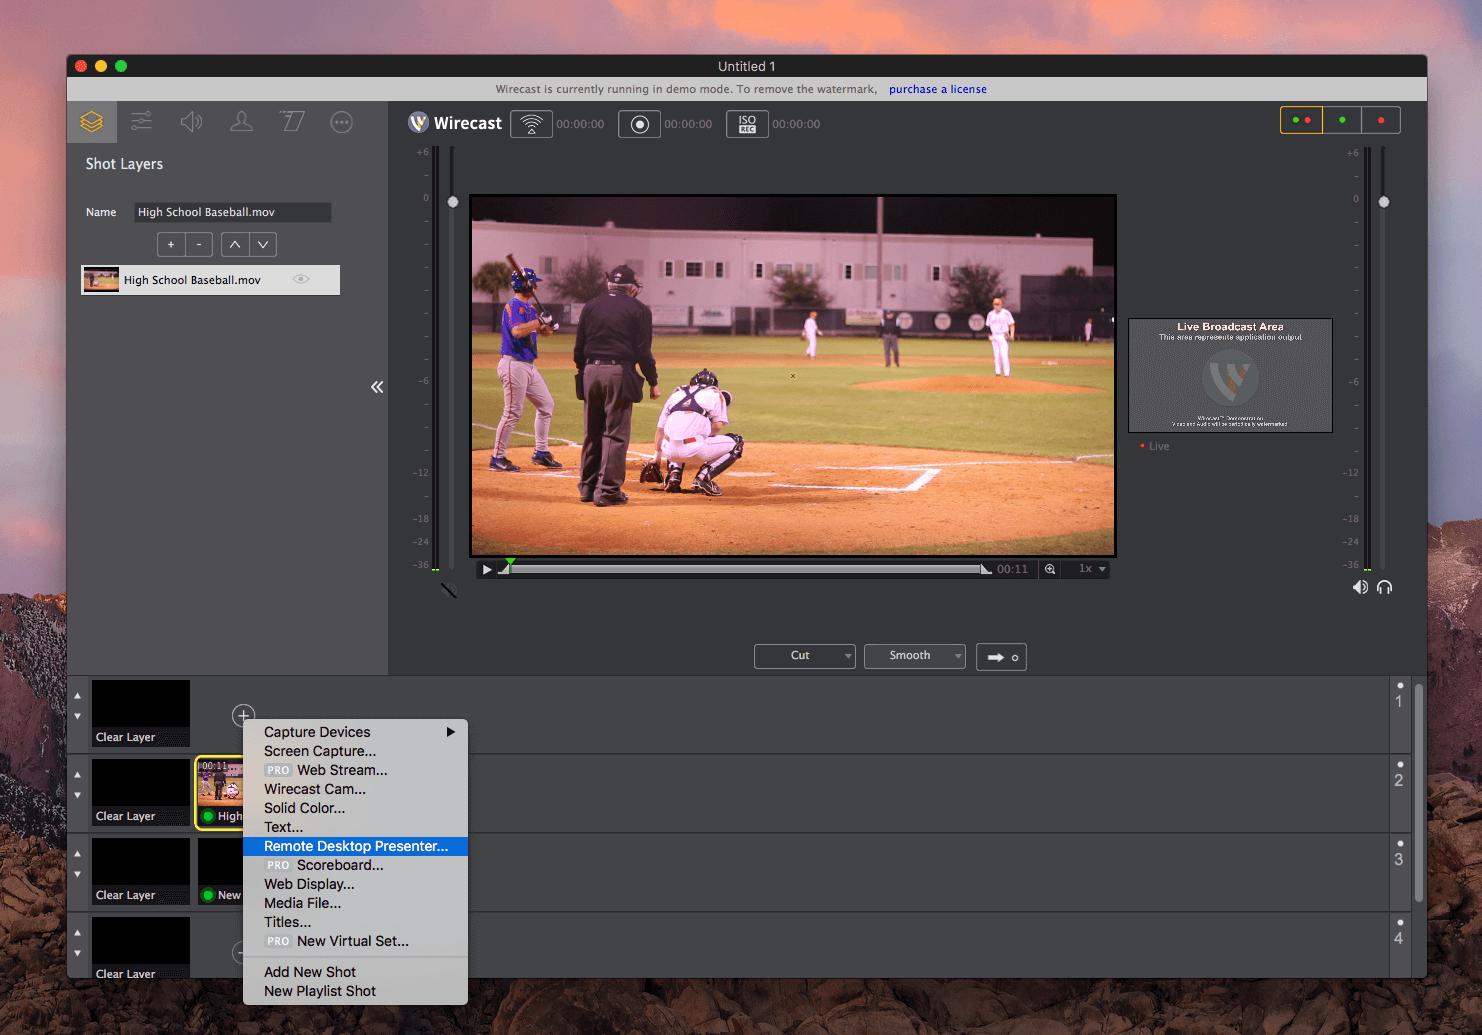 Wirecast MAC OS X and Live Score | live-score-app com